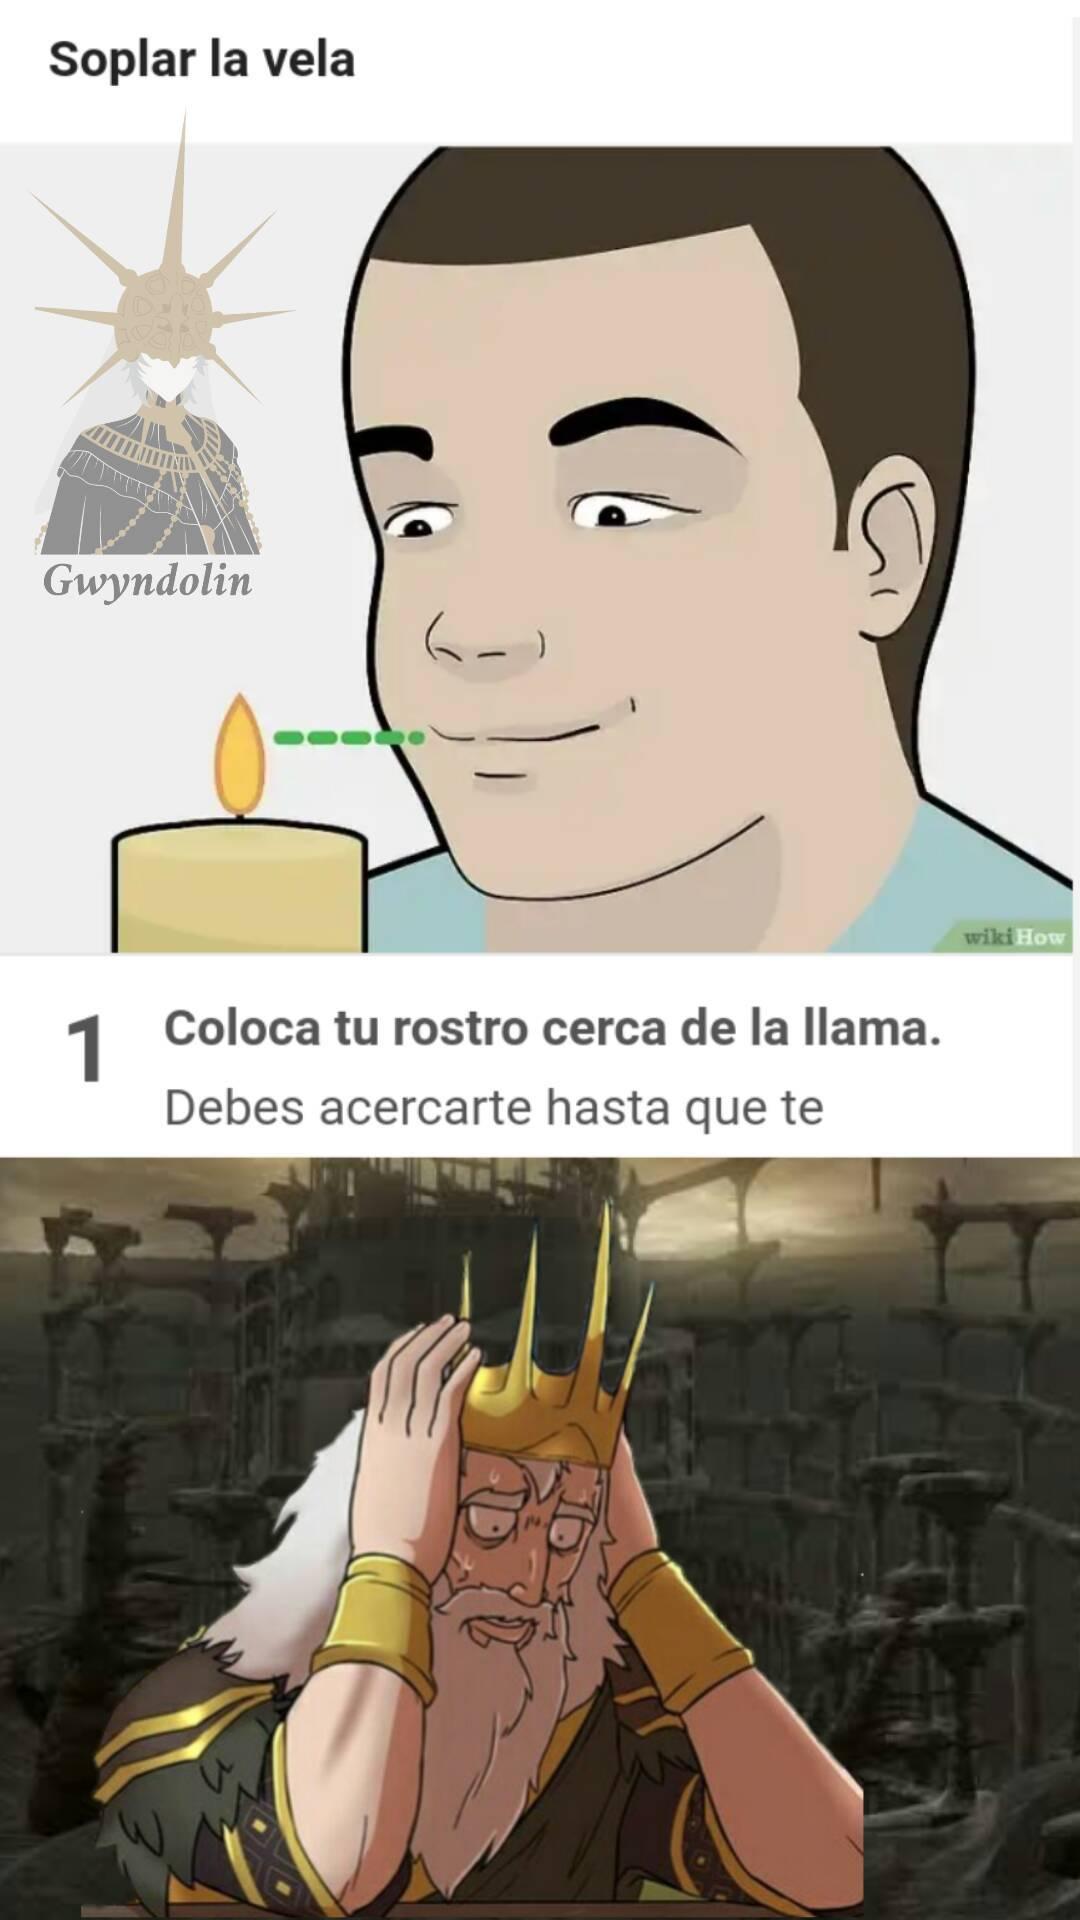 Sopla la vela - meme